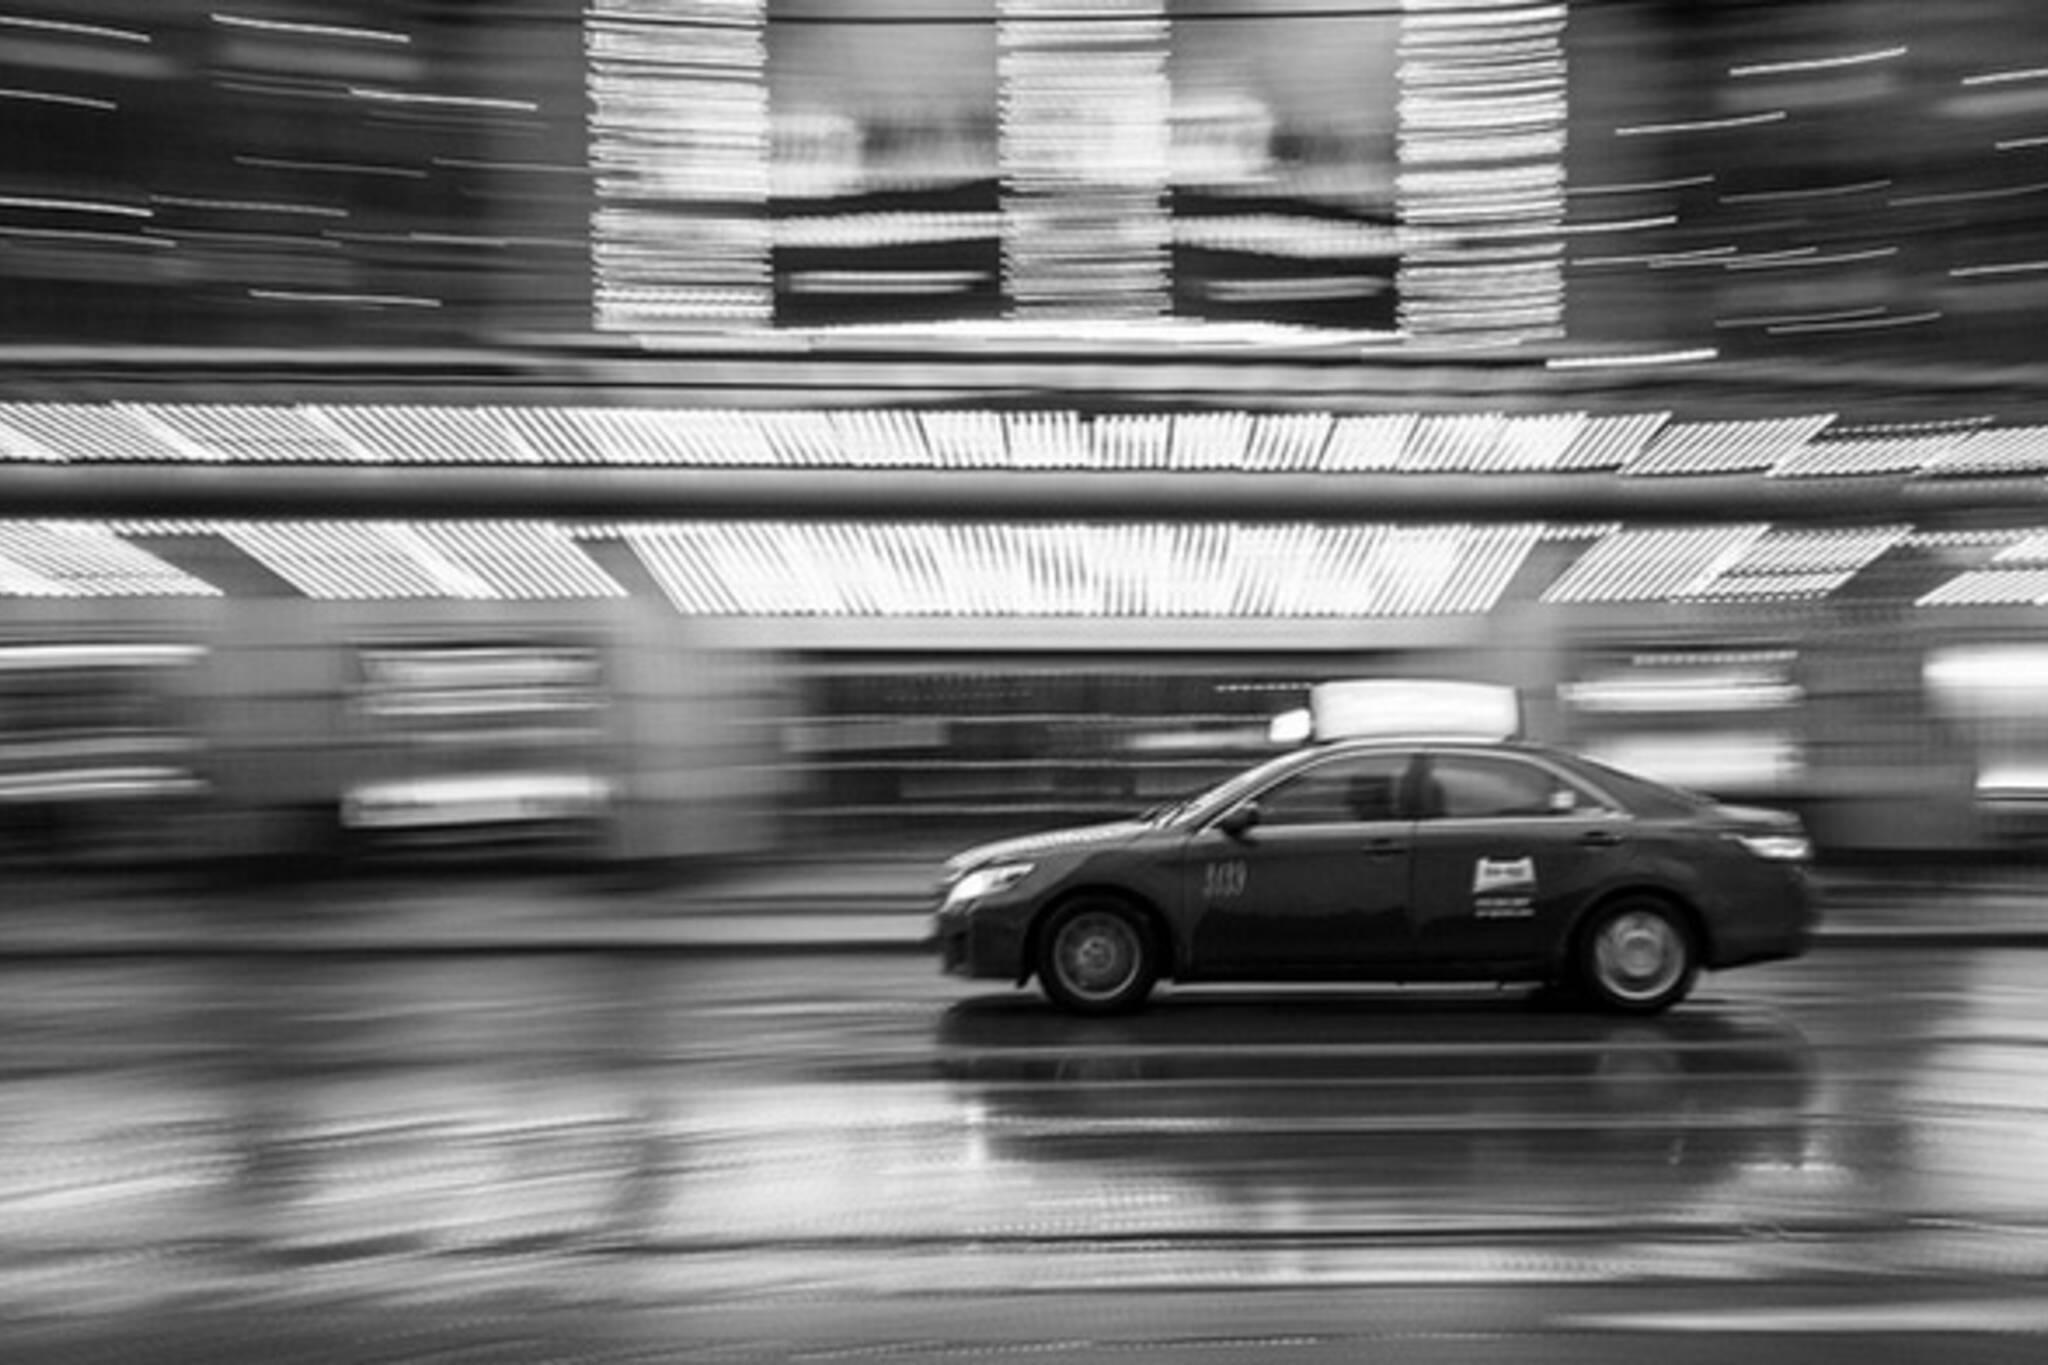 King Street Cab